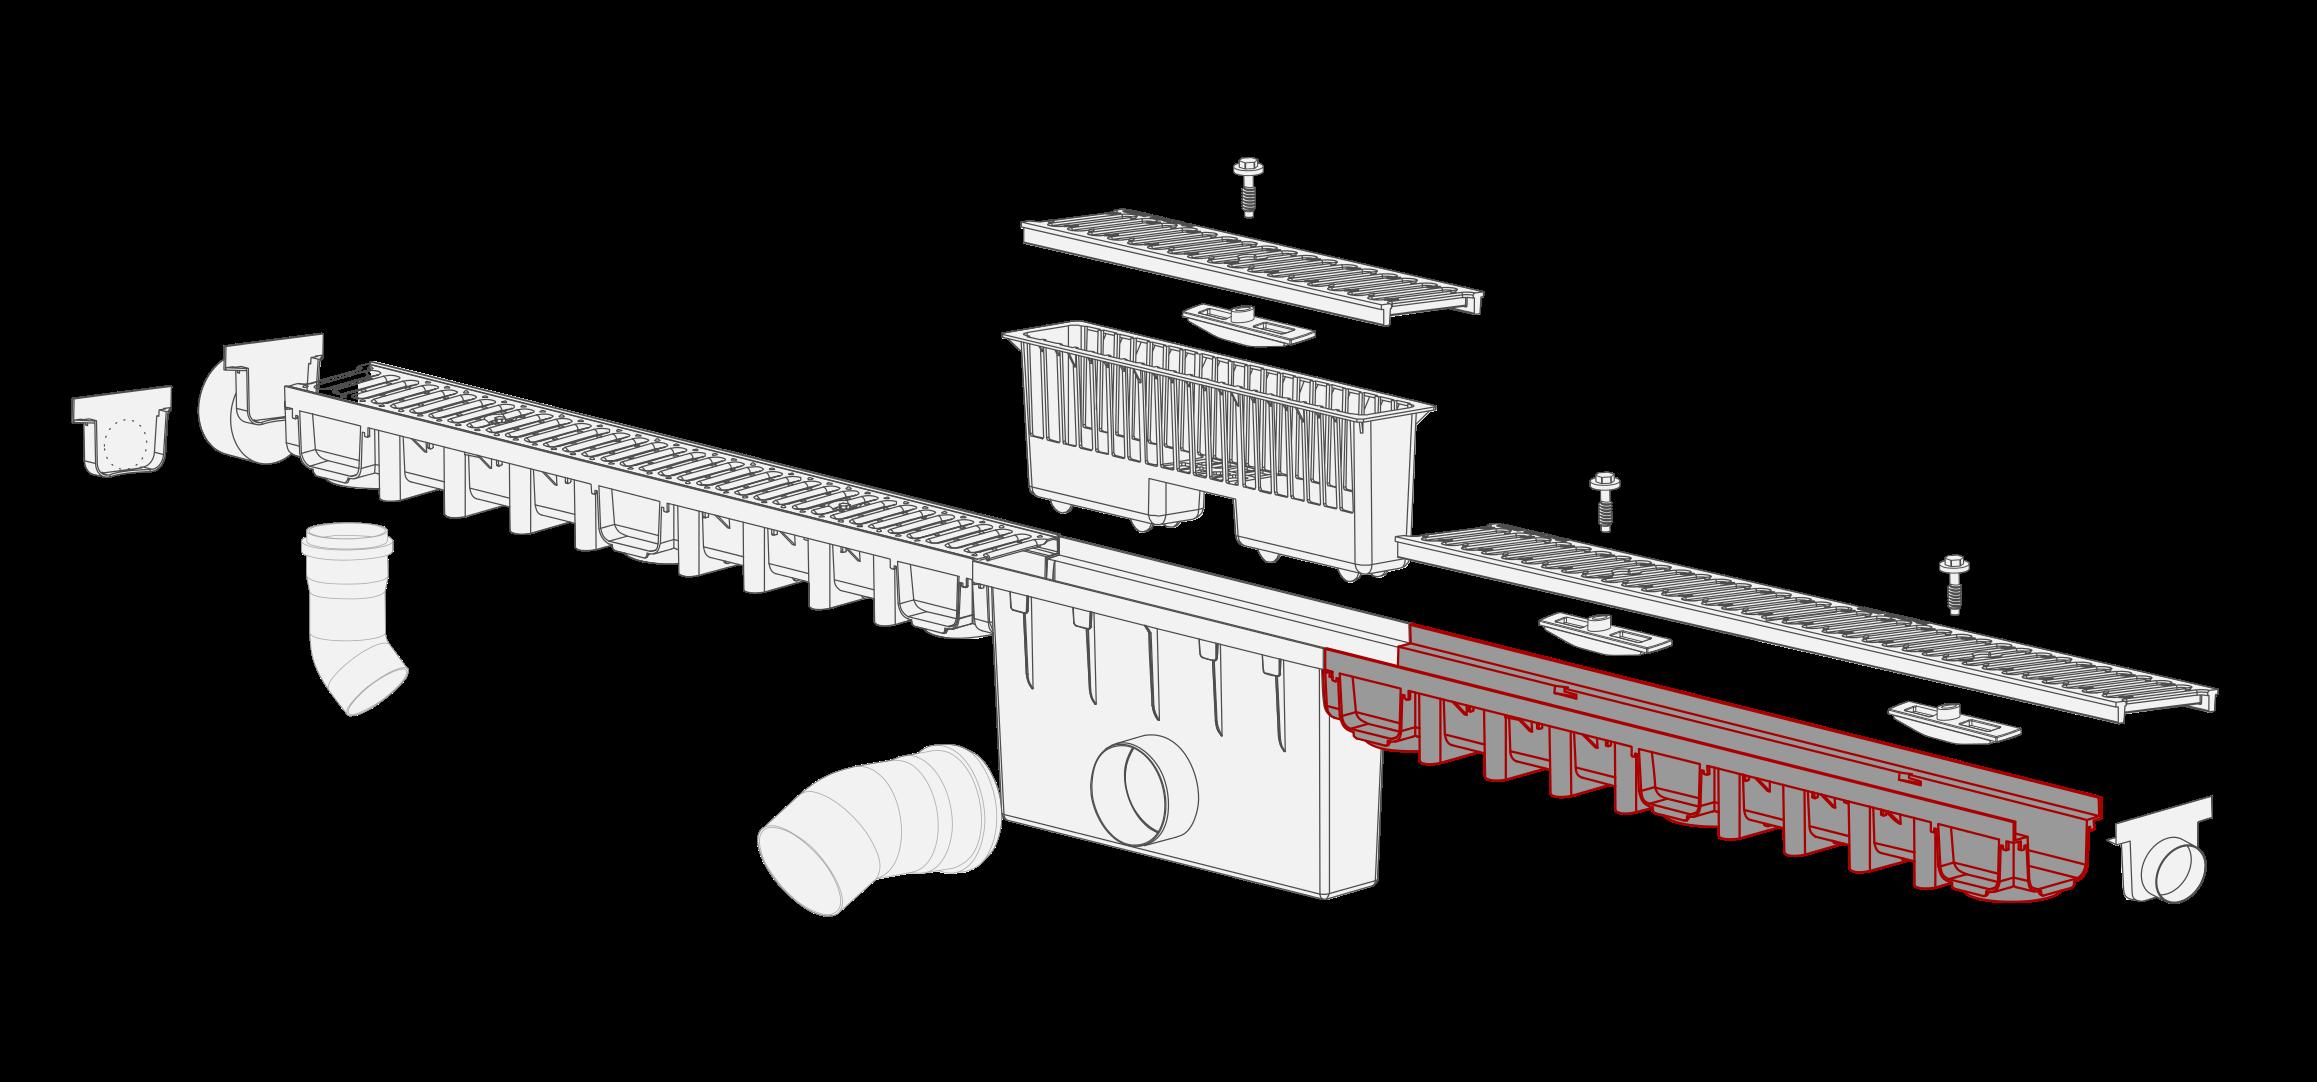 System 1000x98 kanal